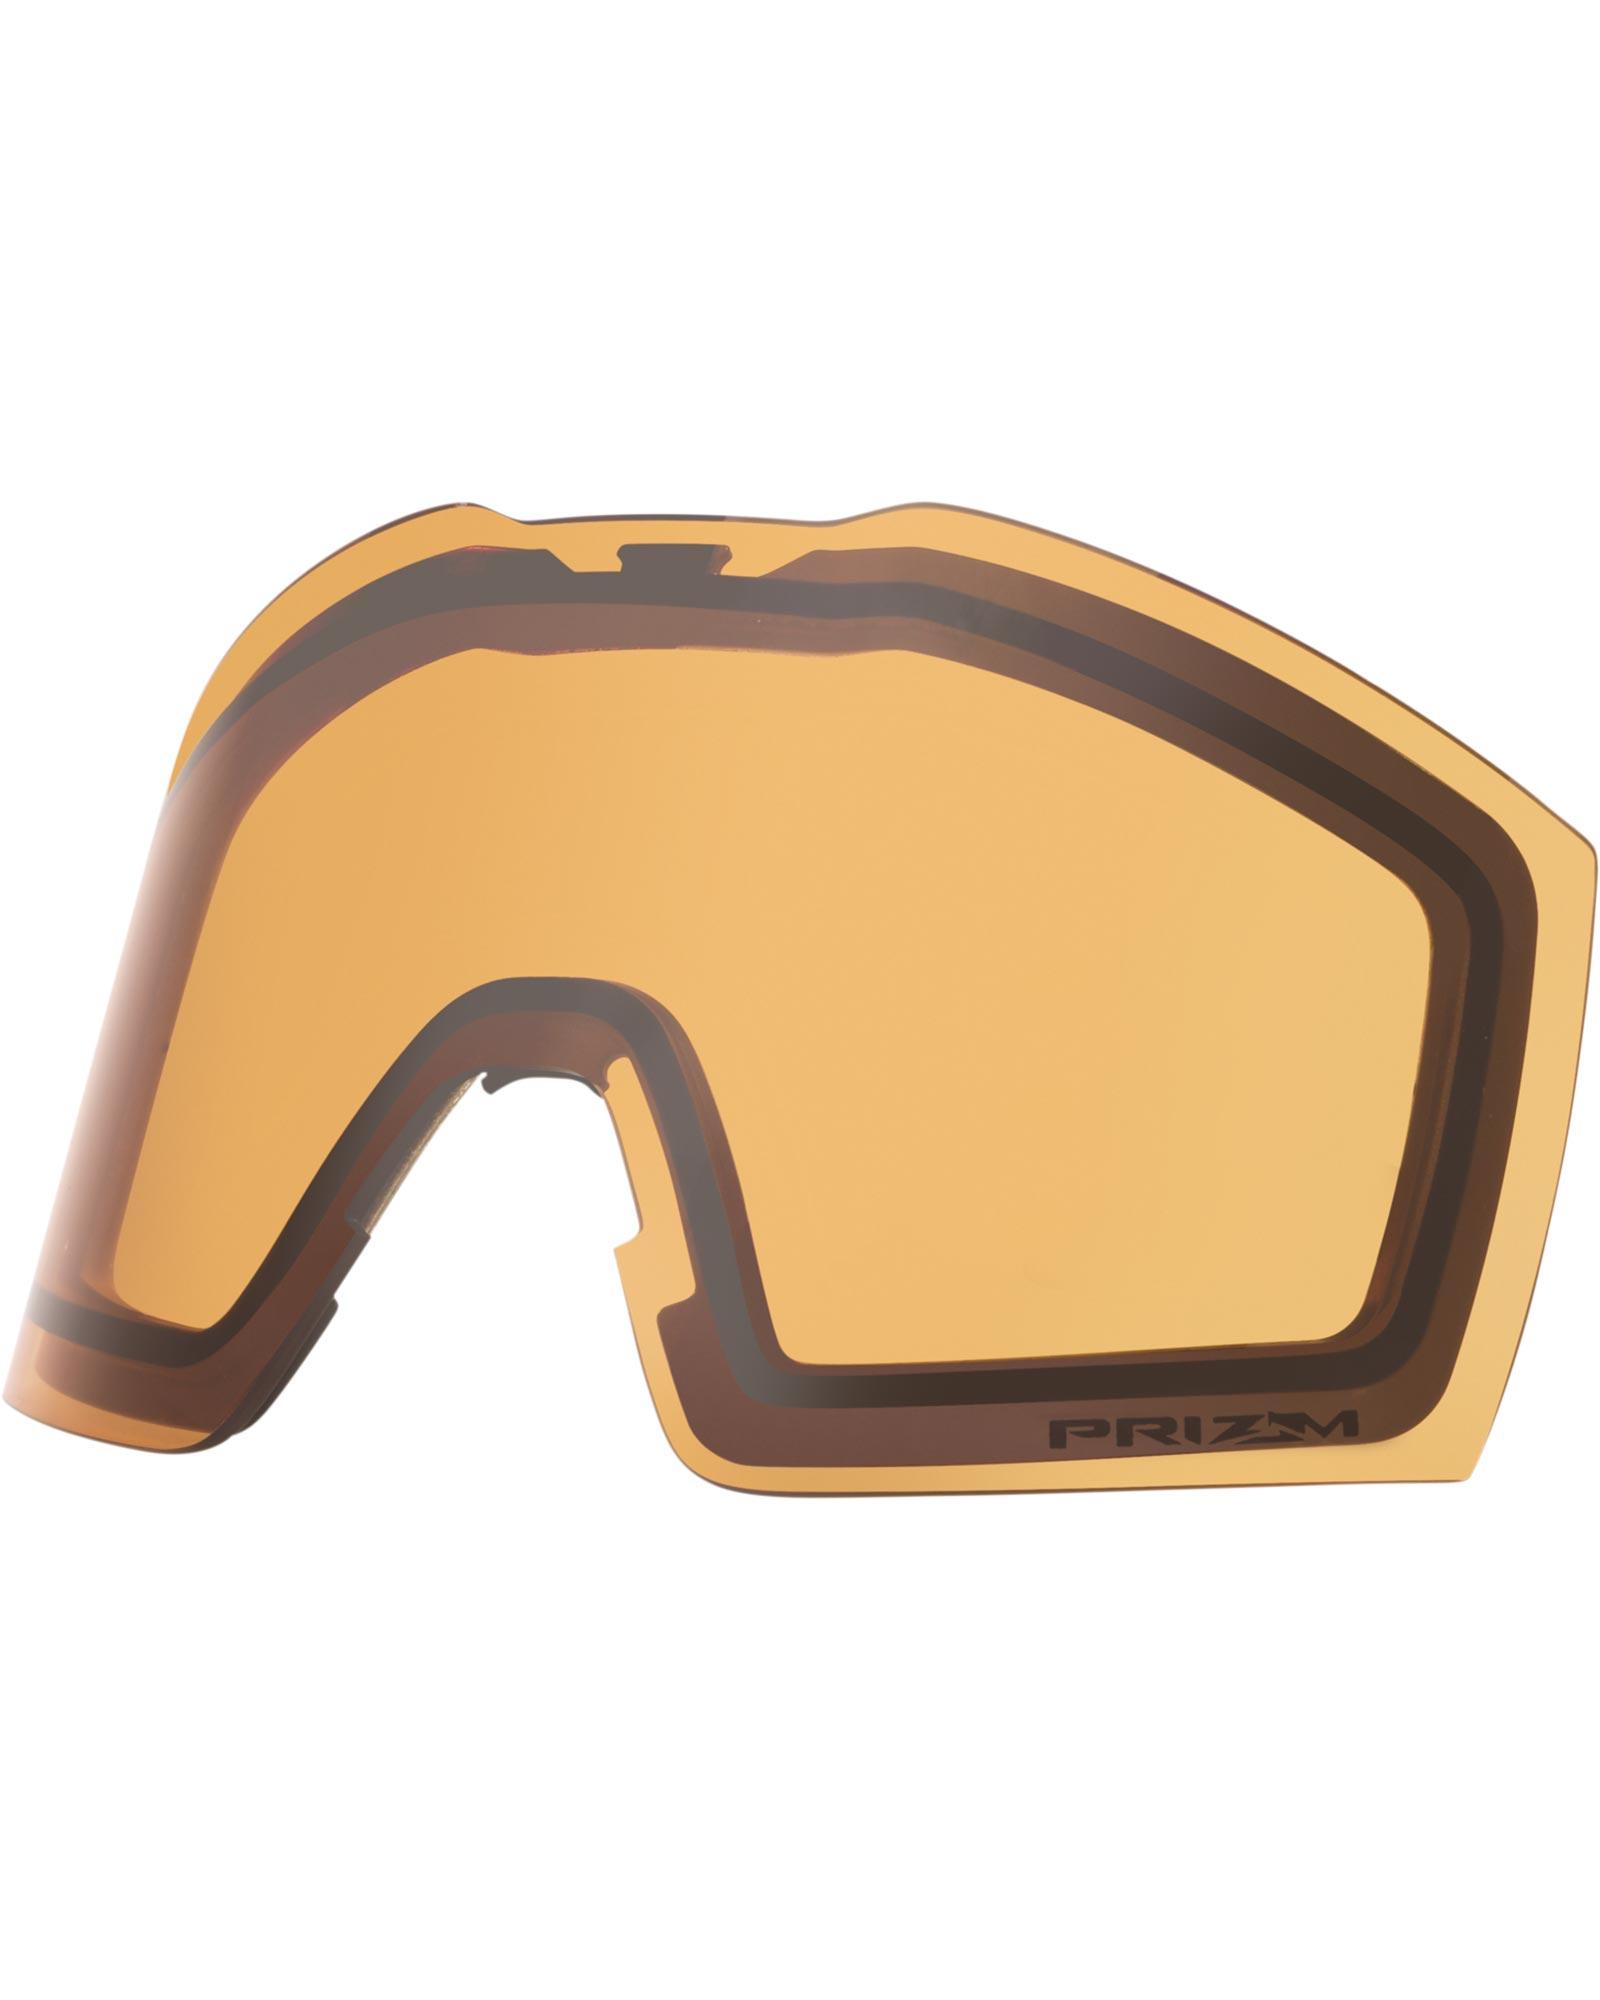 Oakley Fall Line XL Lens Prizm Persimmon Goggle Lens 2020 / 2021 0